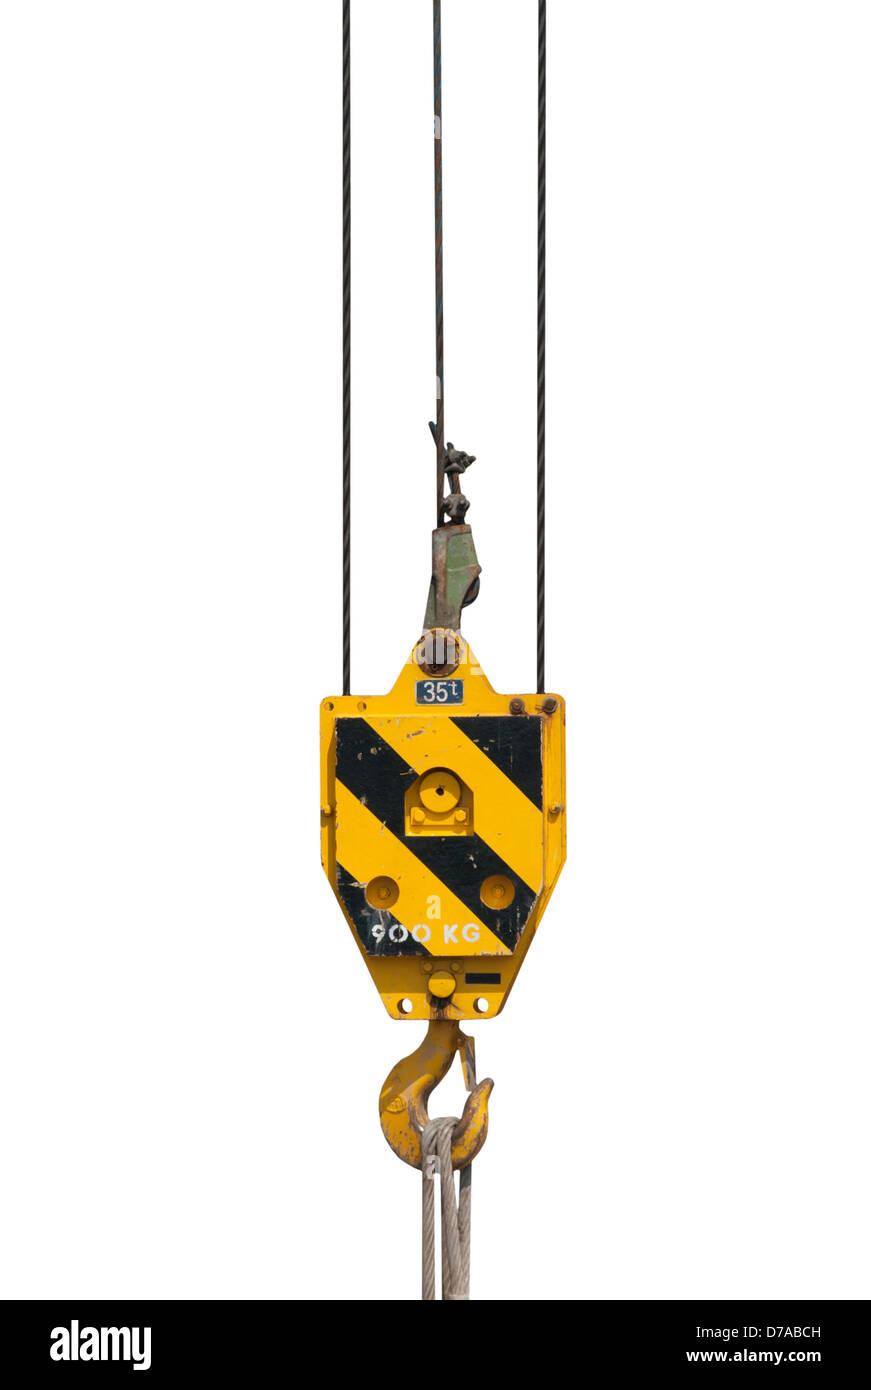 medium resolution of crane block and hook